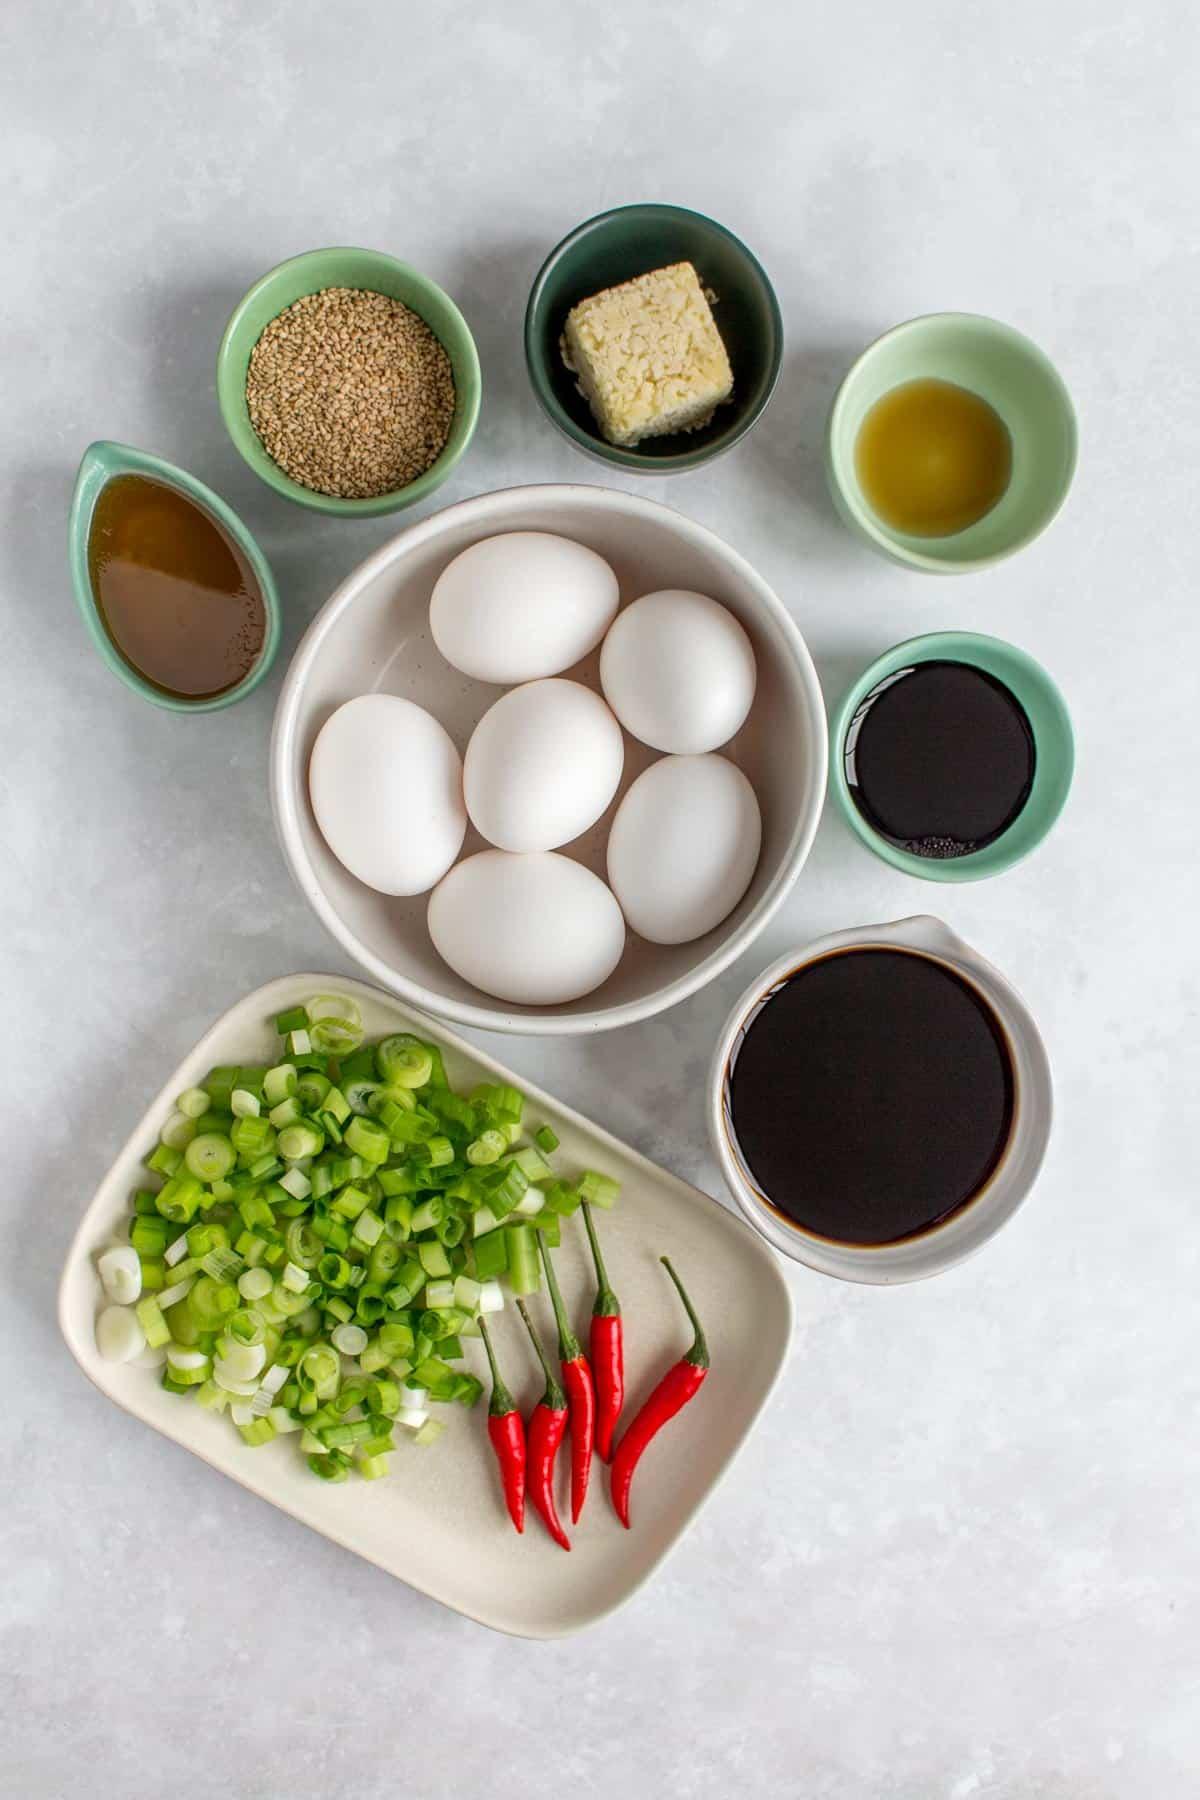 Ingredients needed to make Korean marinated egg (mayak eggs)